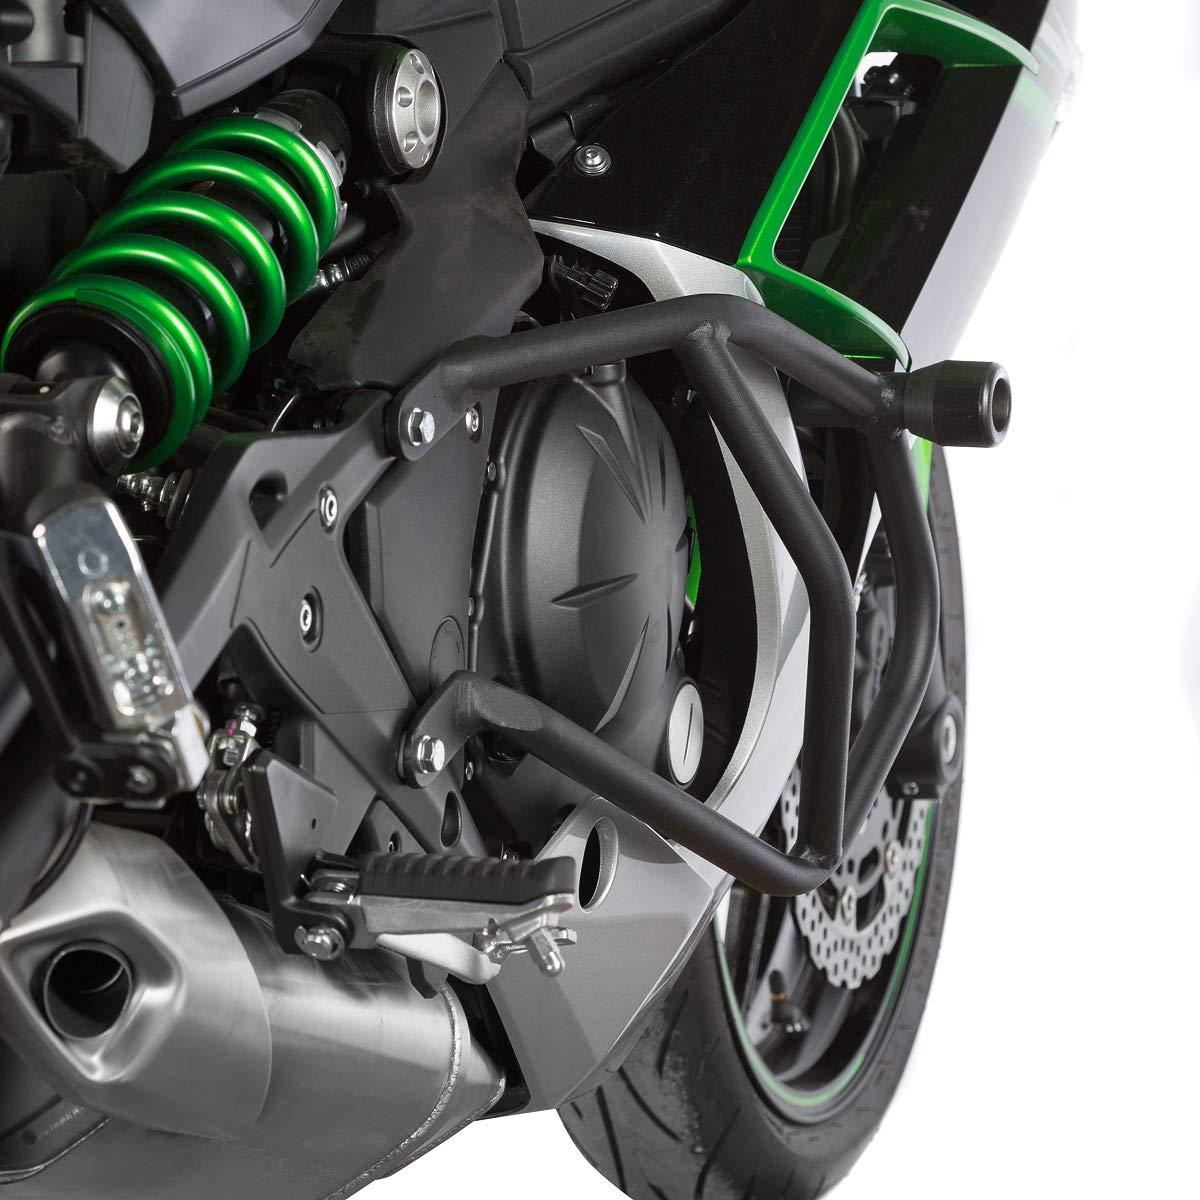 Kawasaki Ninja650r Er6 F 2012 2016 R Gaza Crash Bars Engine Guards With Sliders